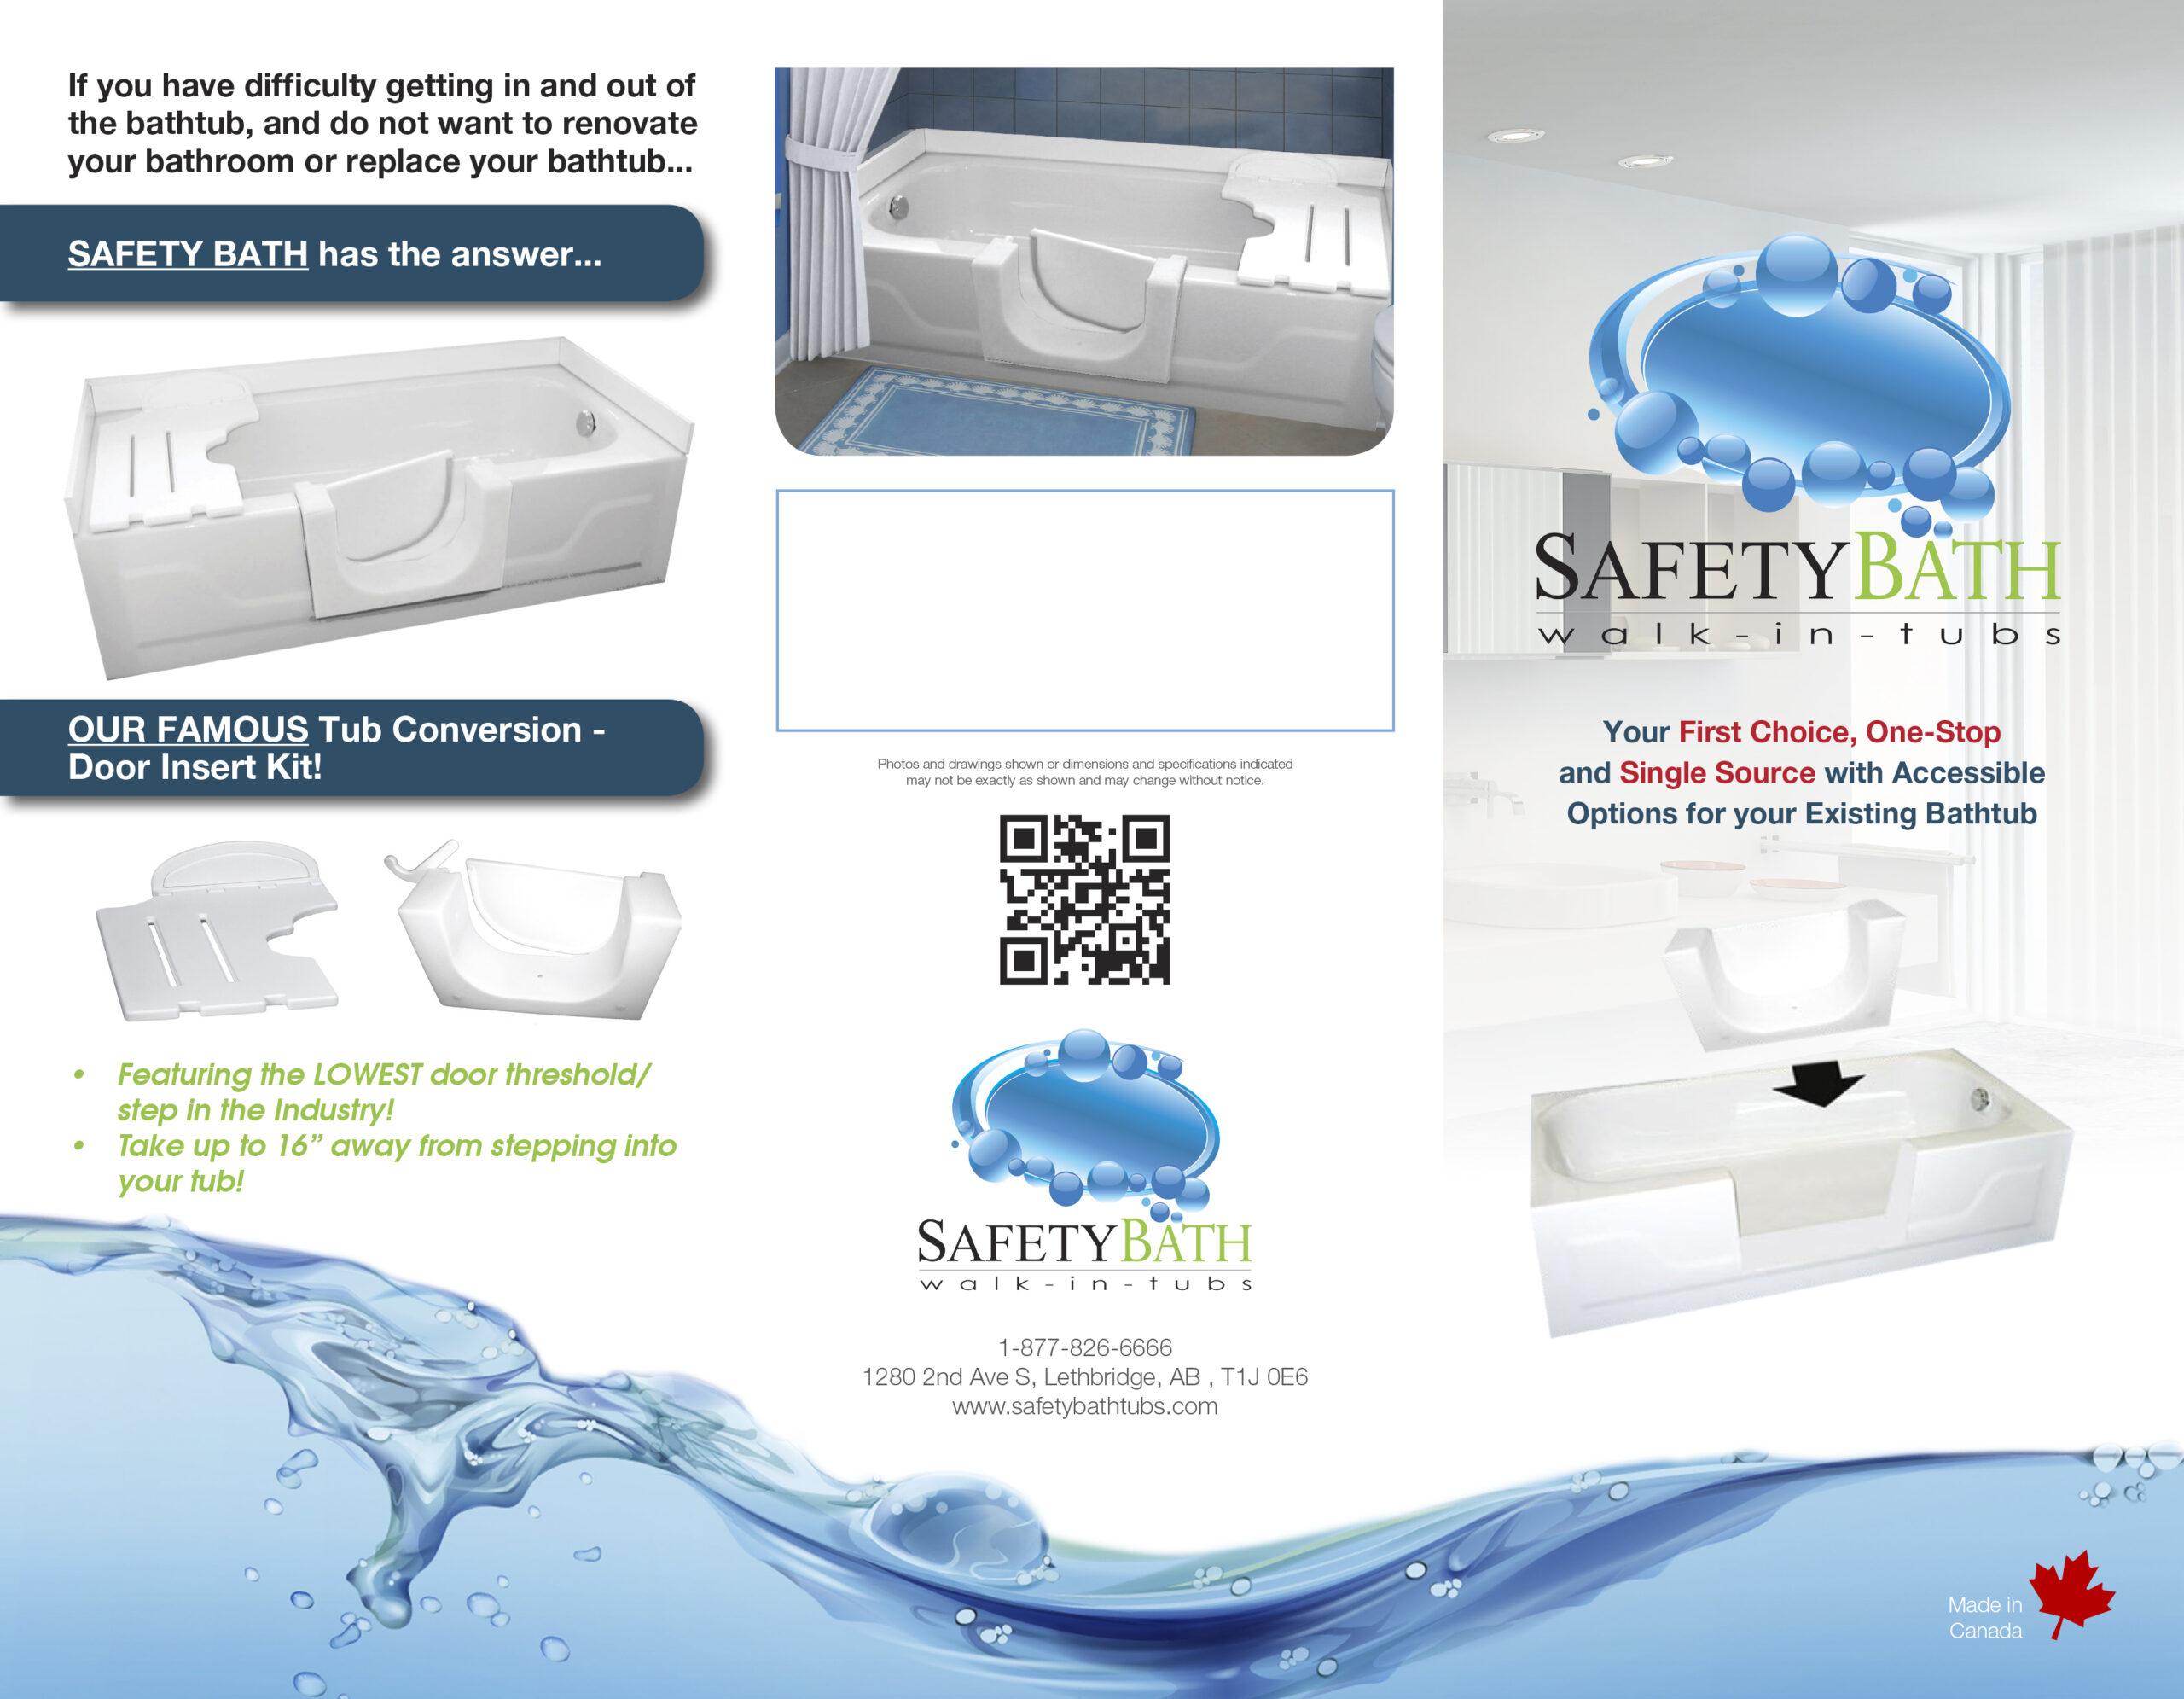 safetybath1